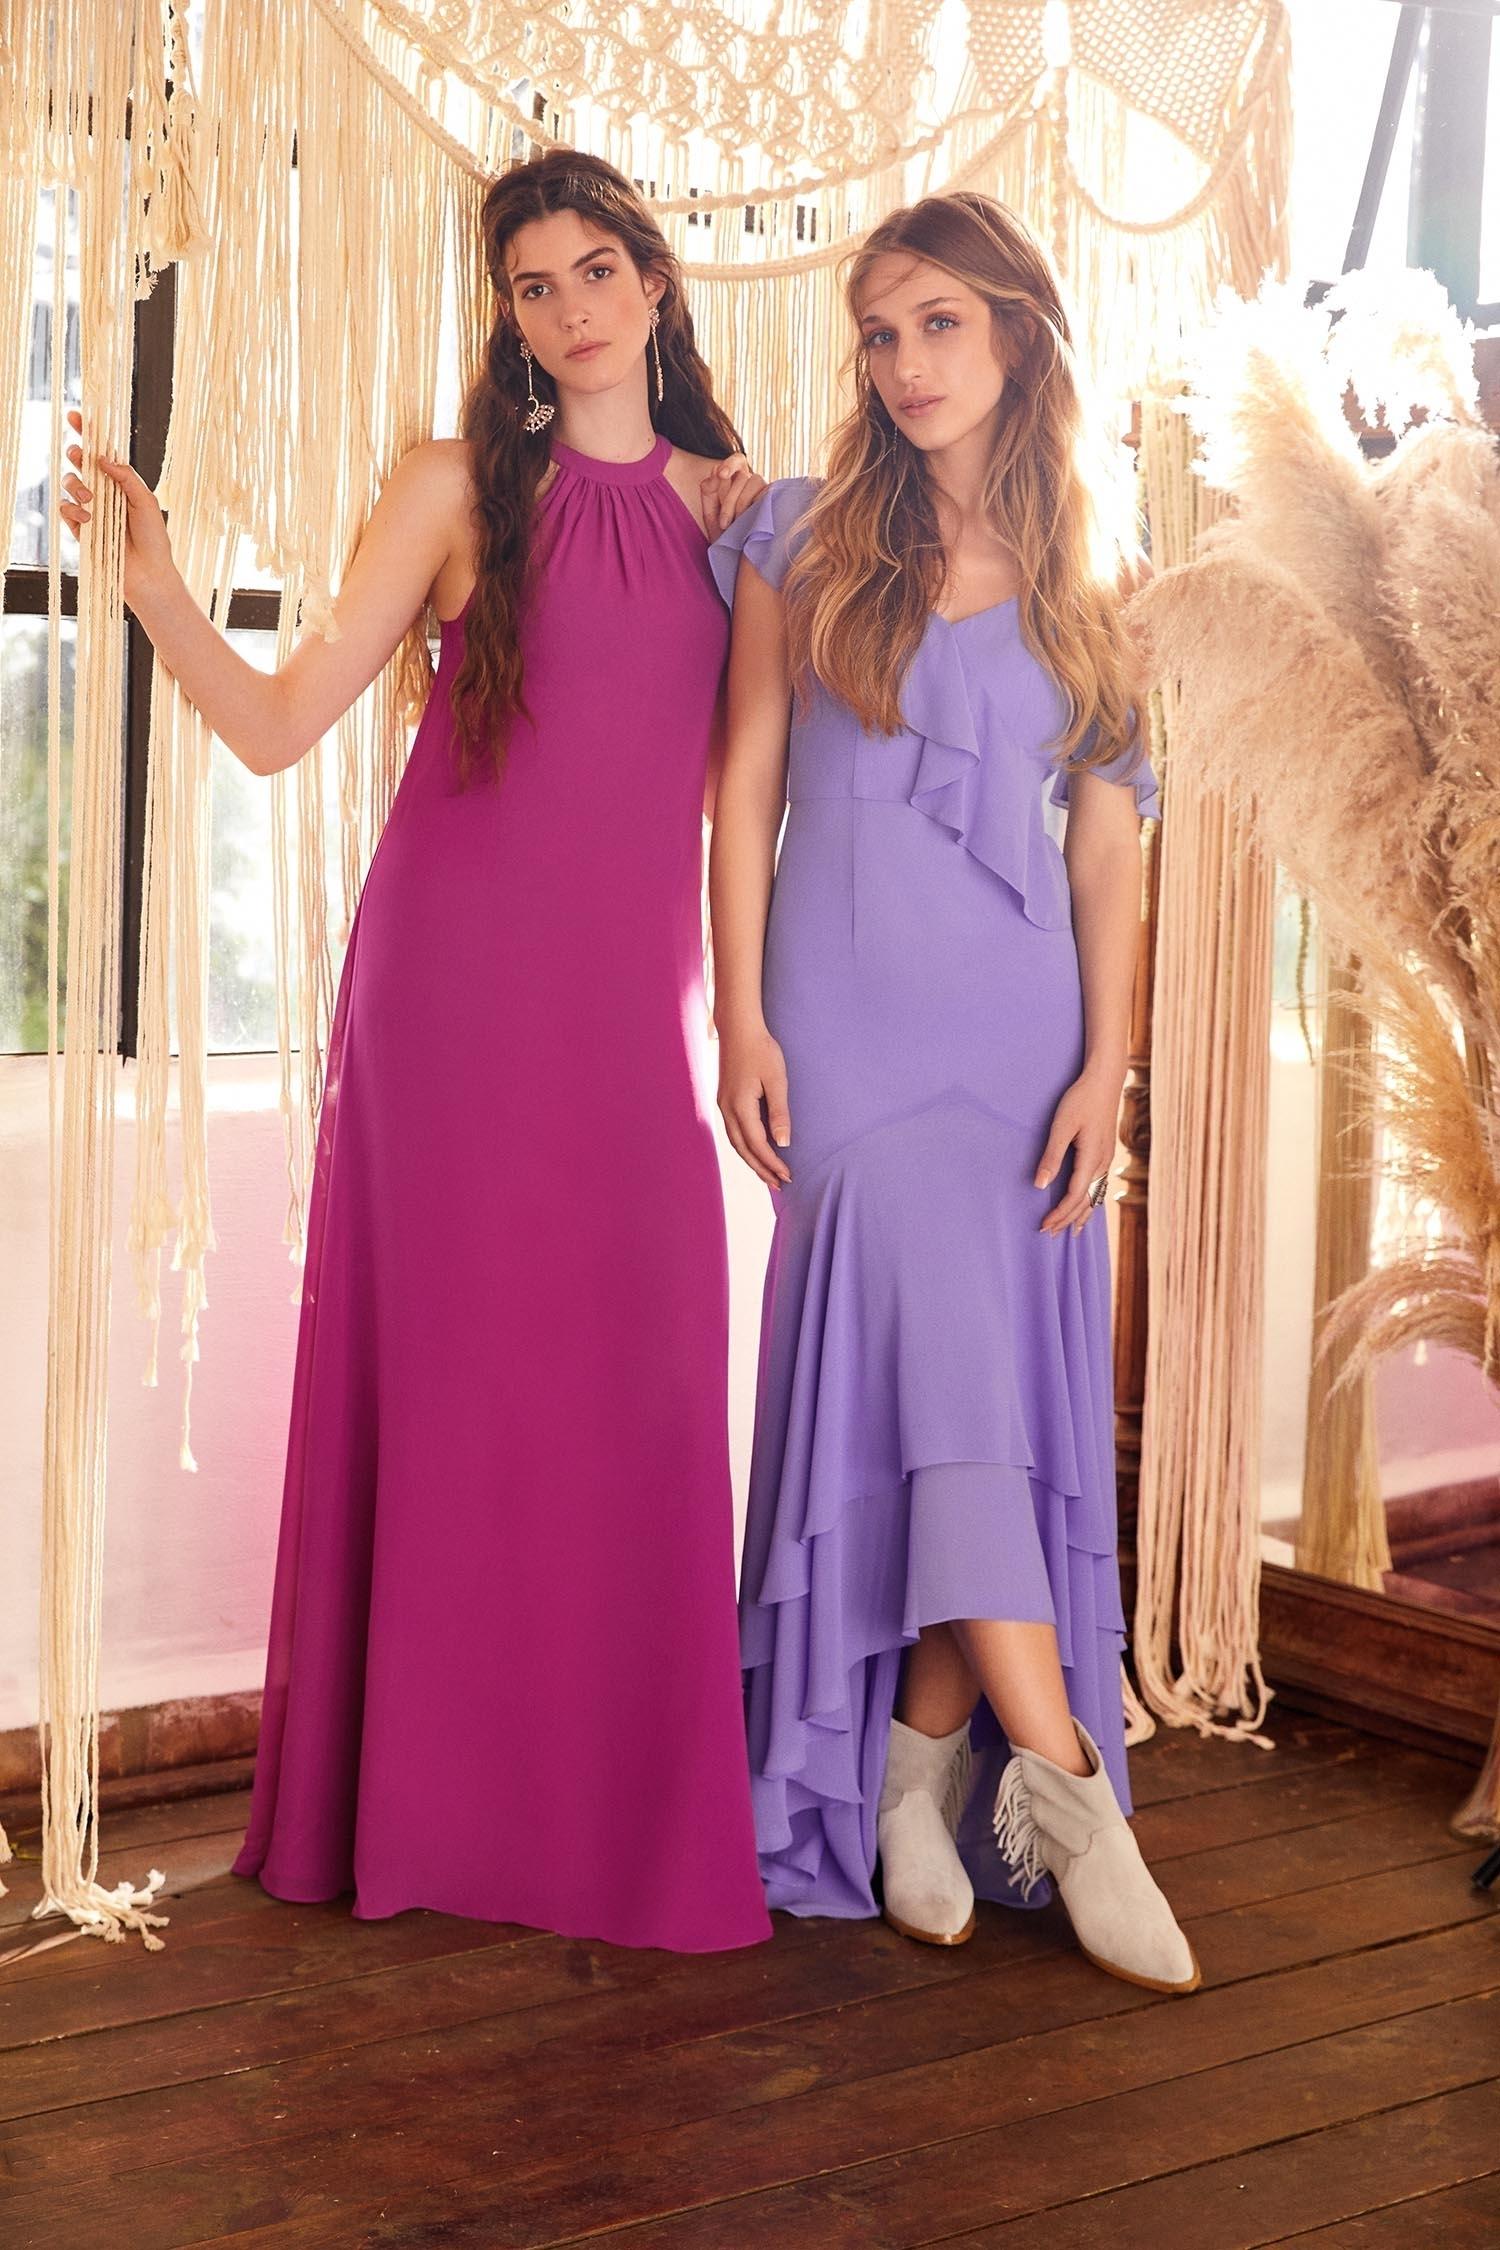 Erguvan Rengi Halter Yaka Şifon Elbise - Thumbnail